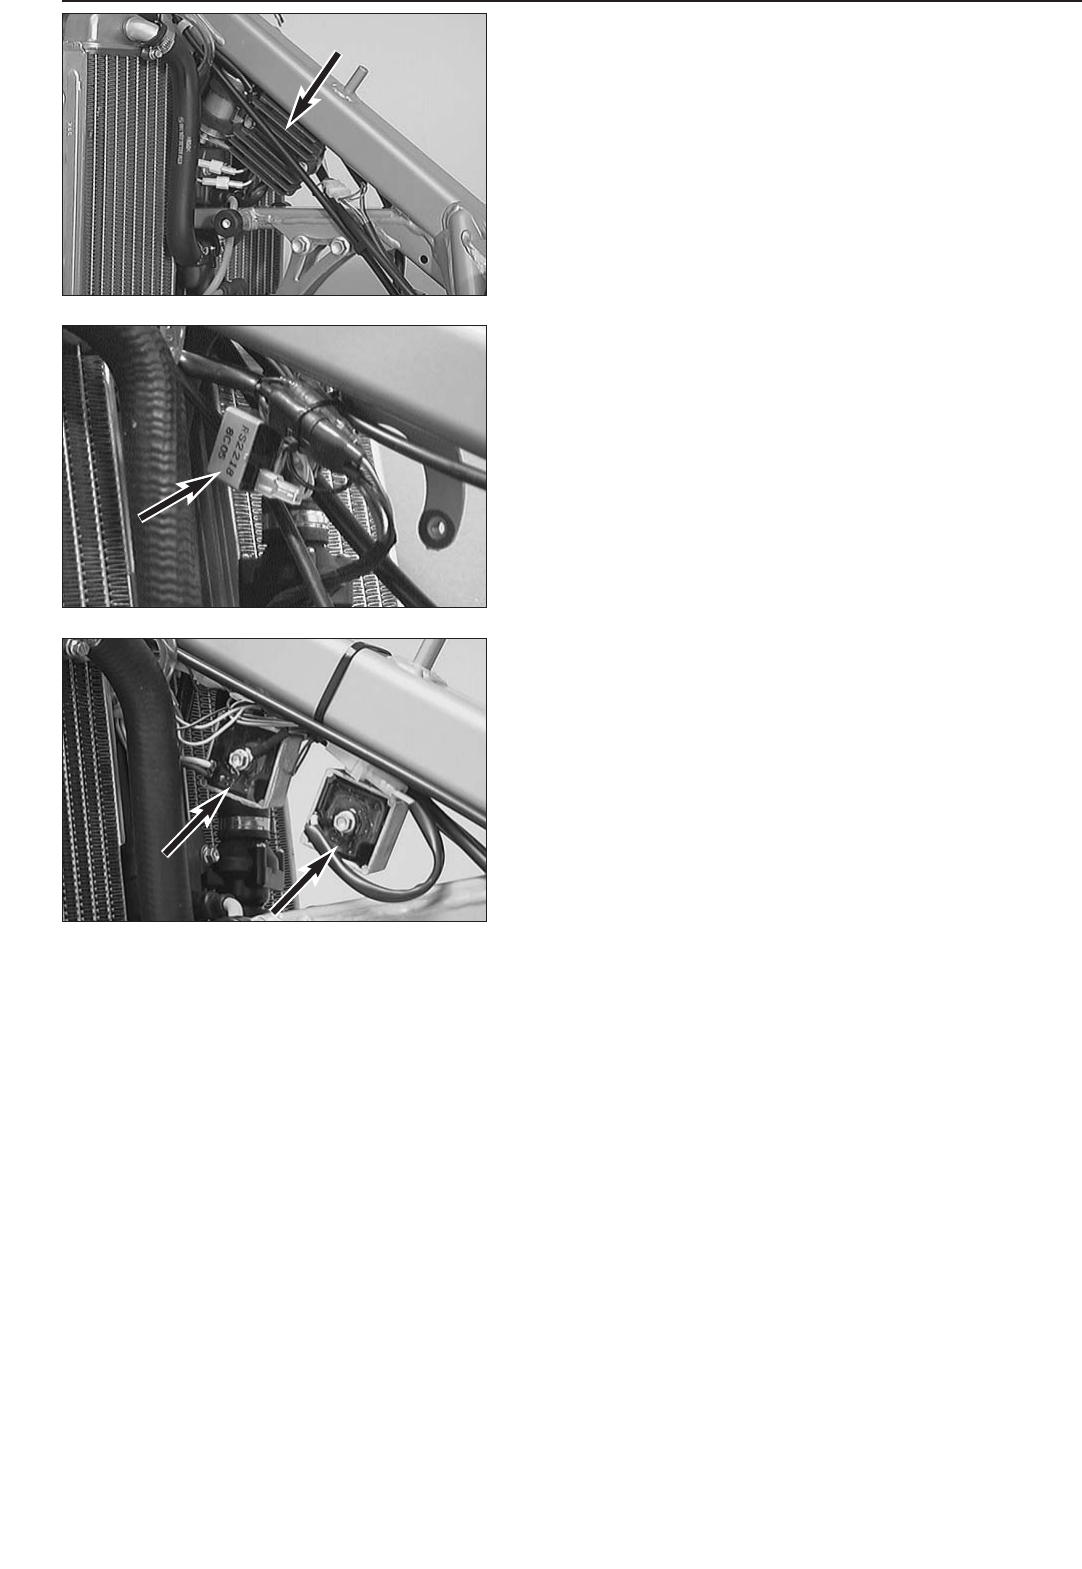 hight resolution of ktm 380 wiring diagram wiring diagram for you handleiding ktm 300 exc pagina 69 van